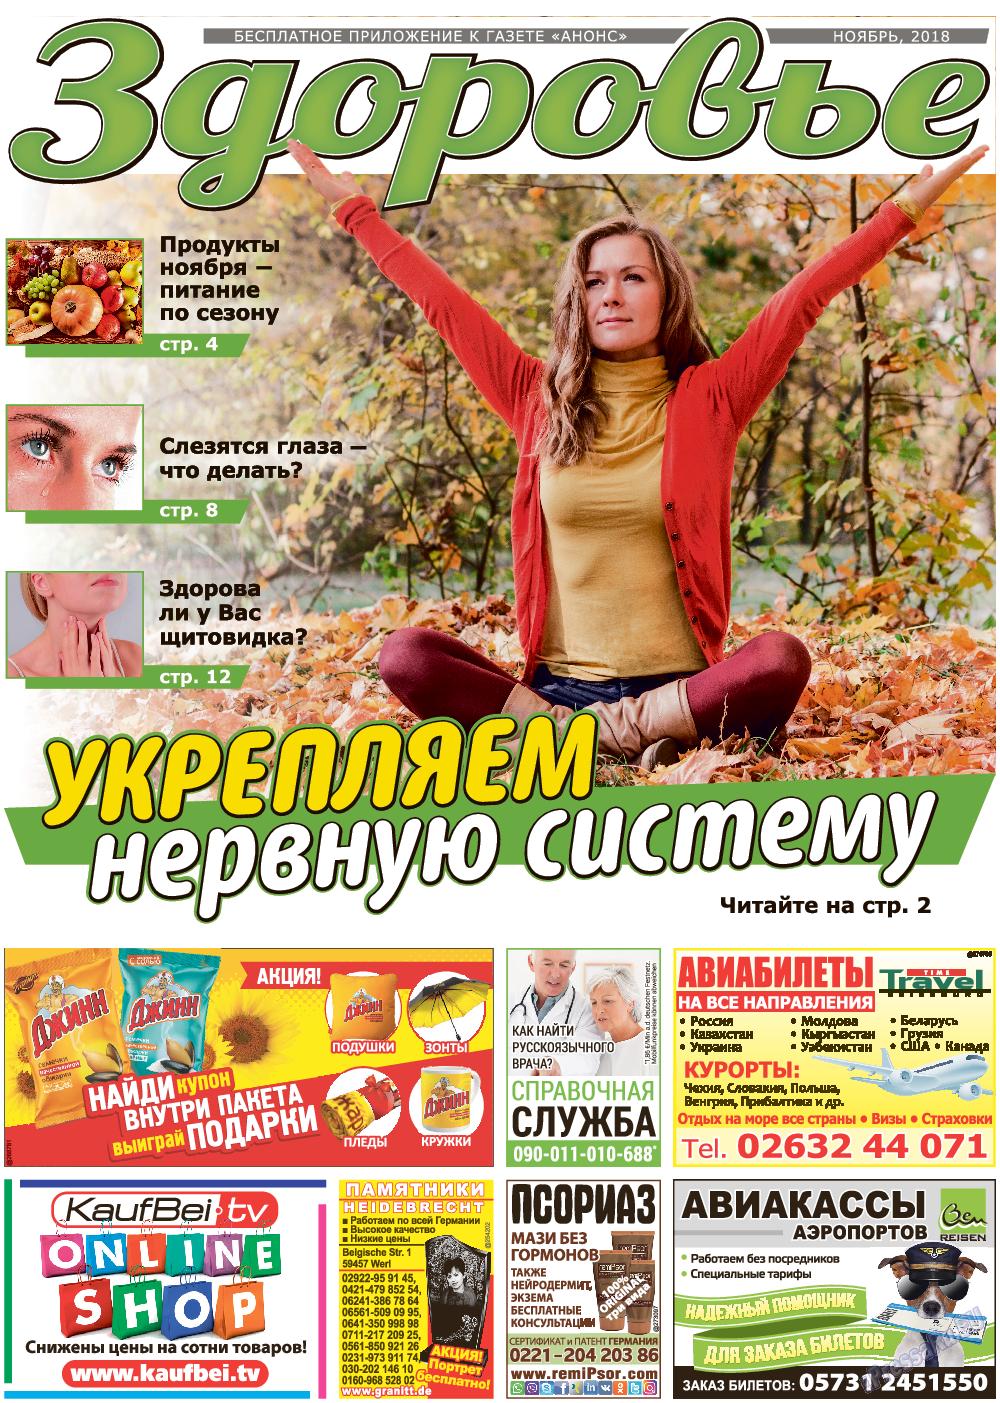 Здоровье (газета). 2018 год, номер 11, стр. 1